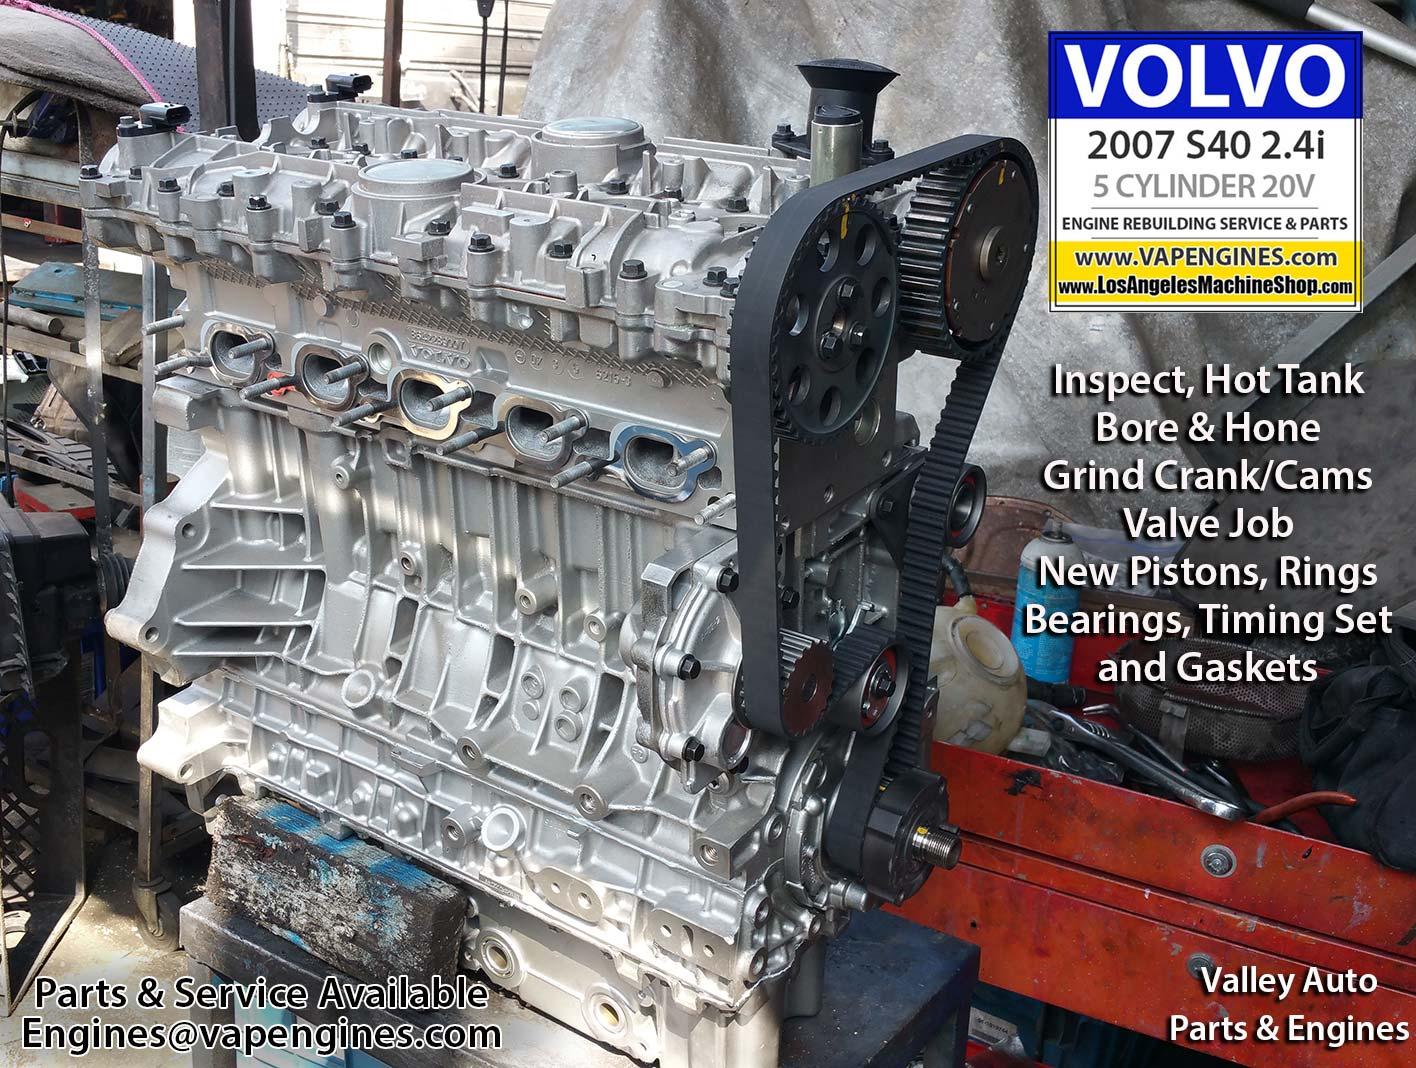 hight resolution of 07 volvo s40 2 4i engine rebuild los angeles machine shop engine rh losangelesmachineshop com 2004